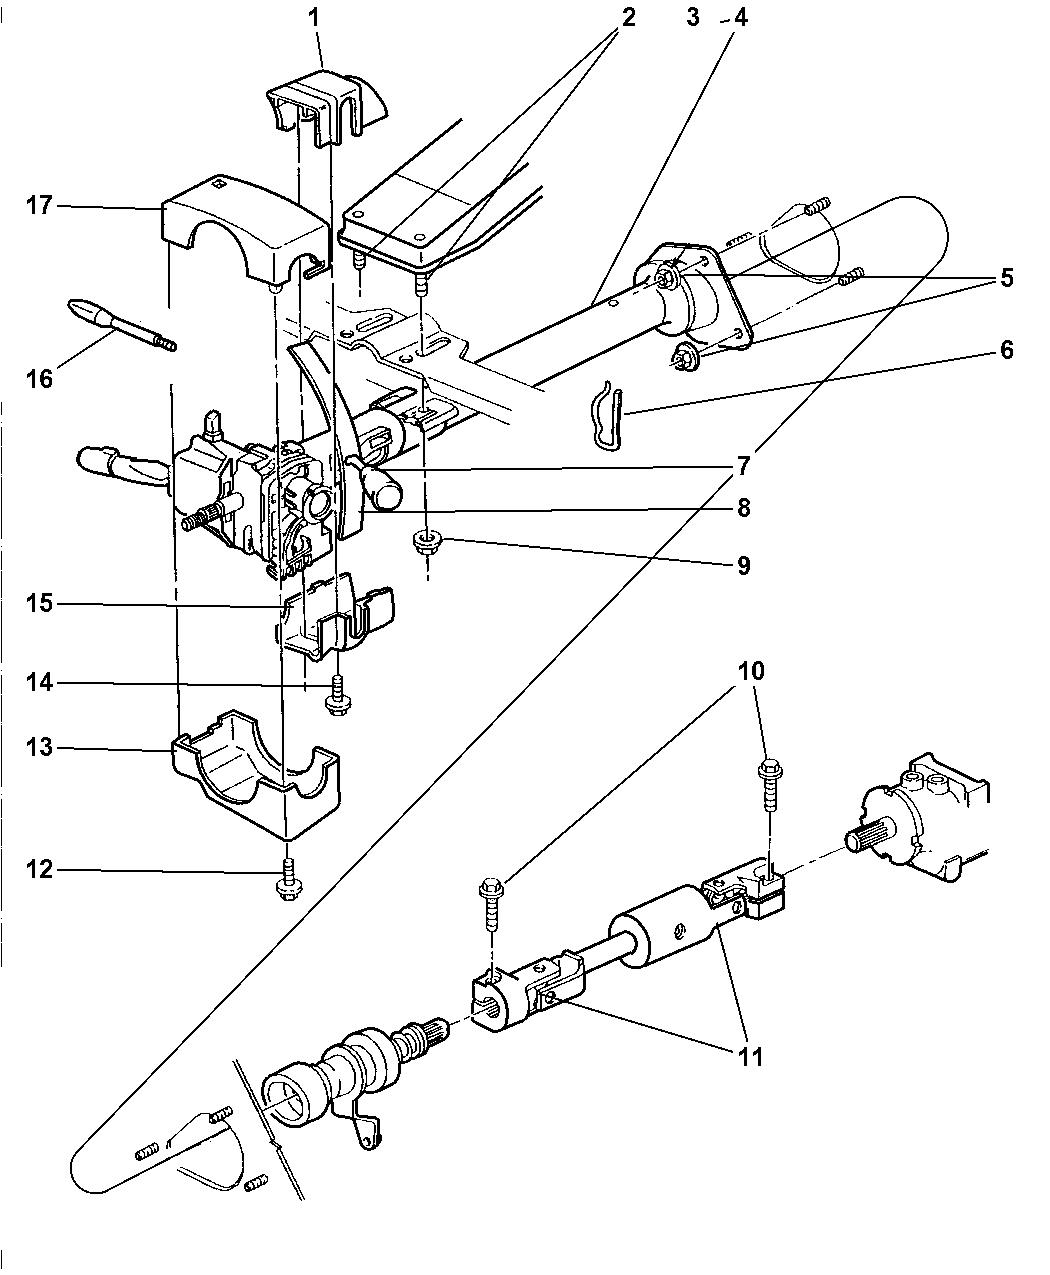 1997 dodge ram 3500 column, steering, upper and lower